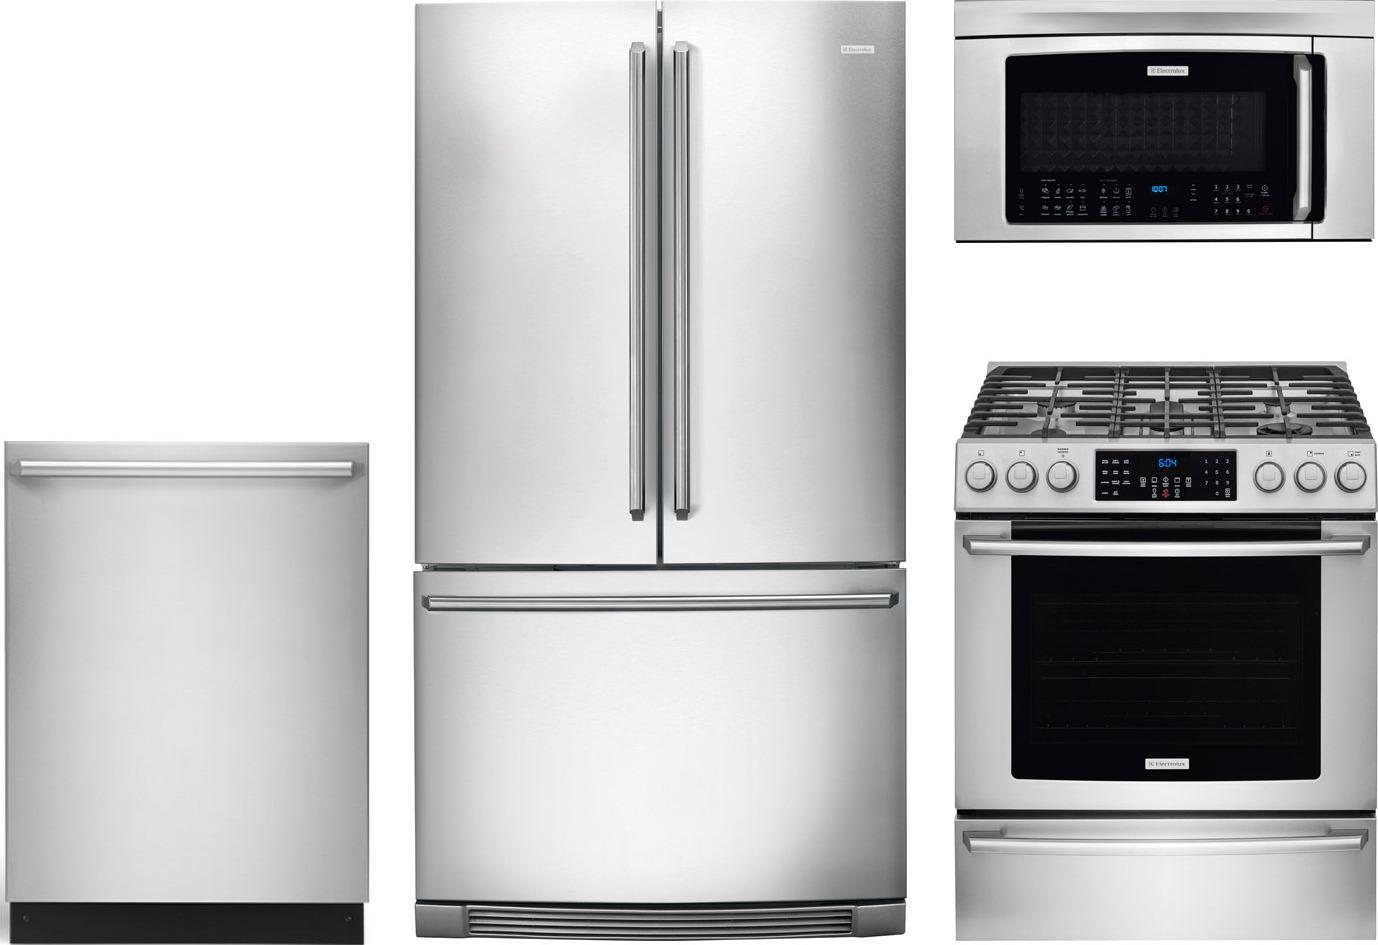 electrolux 4-piece kitchen package with ei30gf45qs gas range